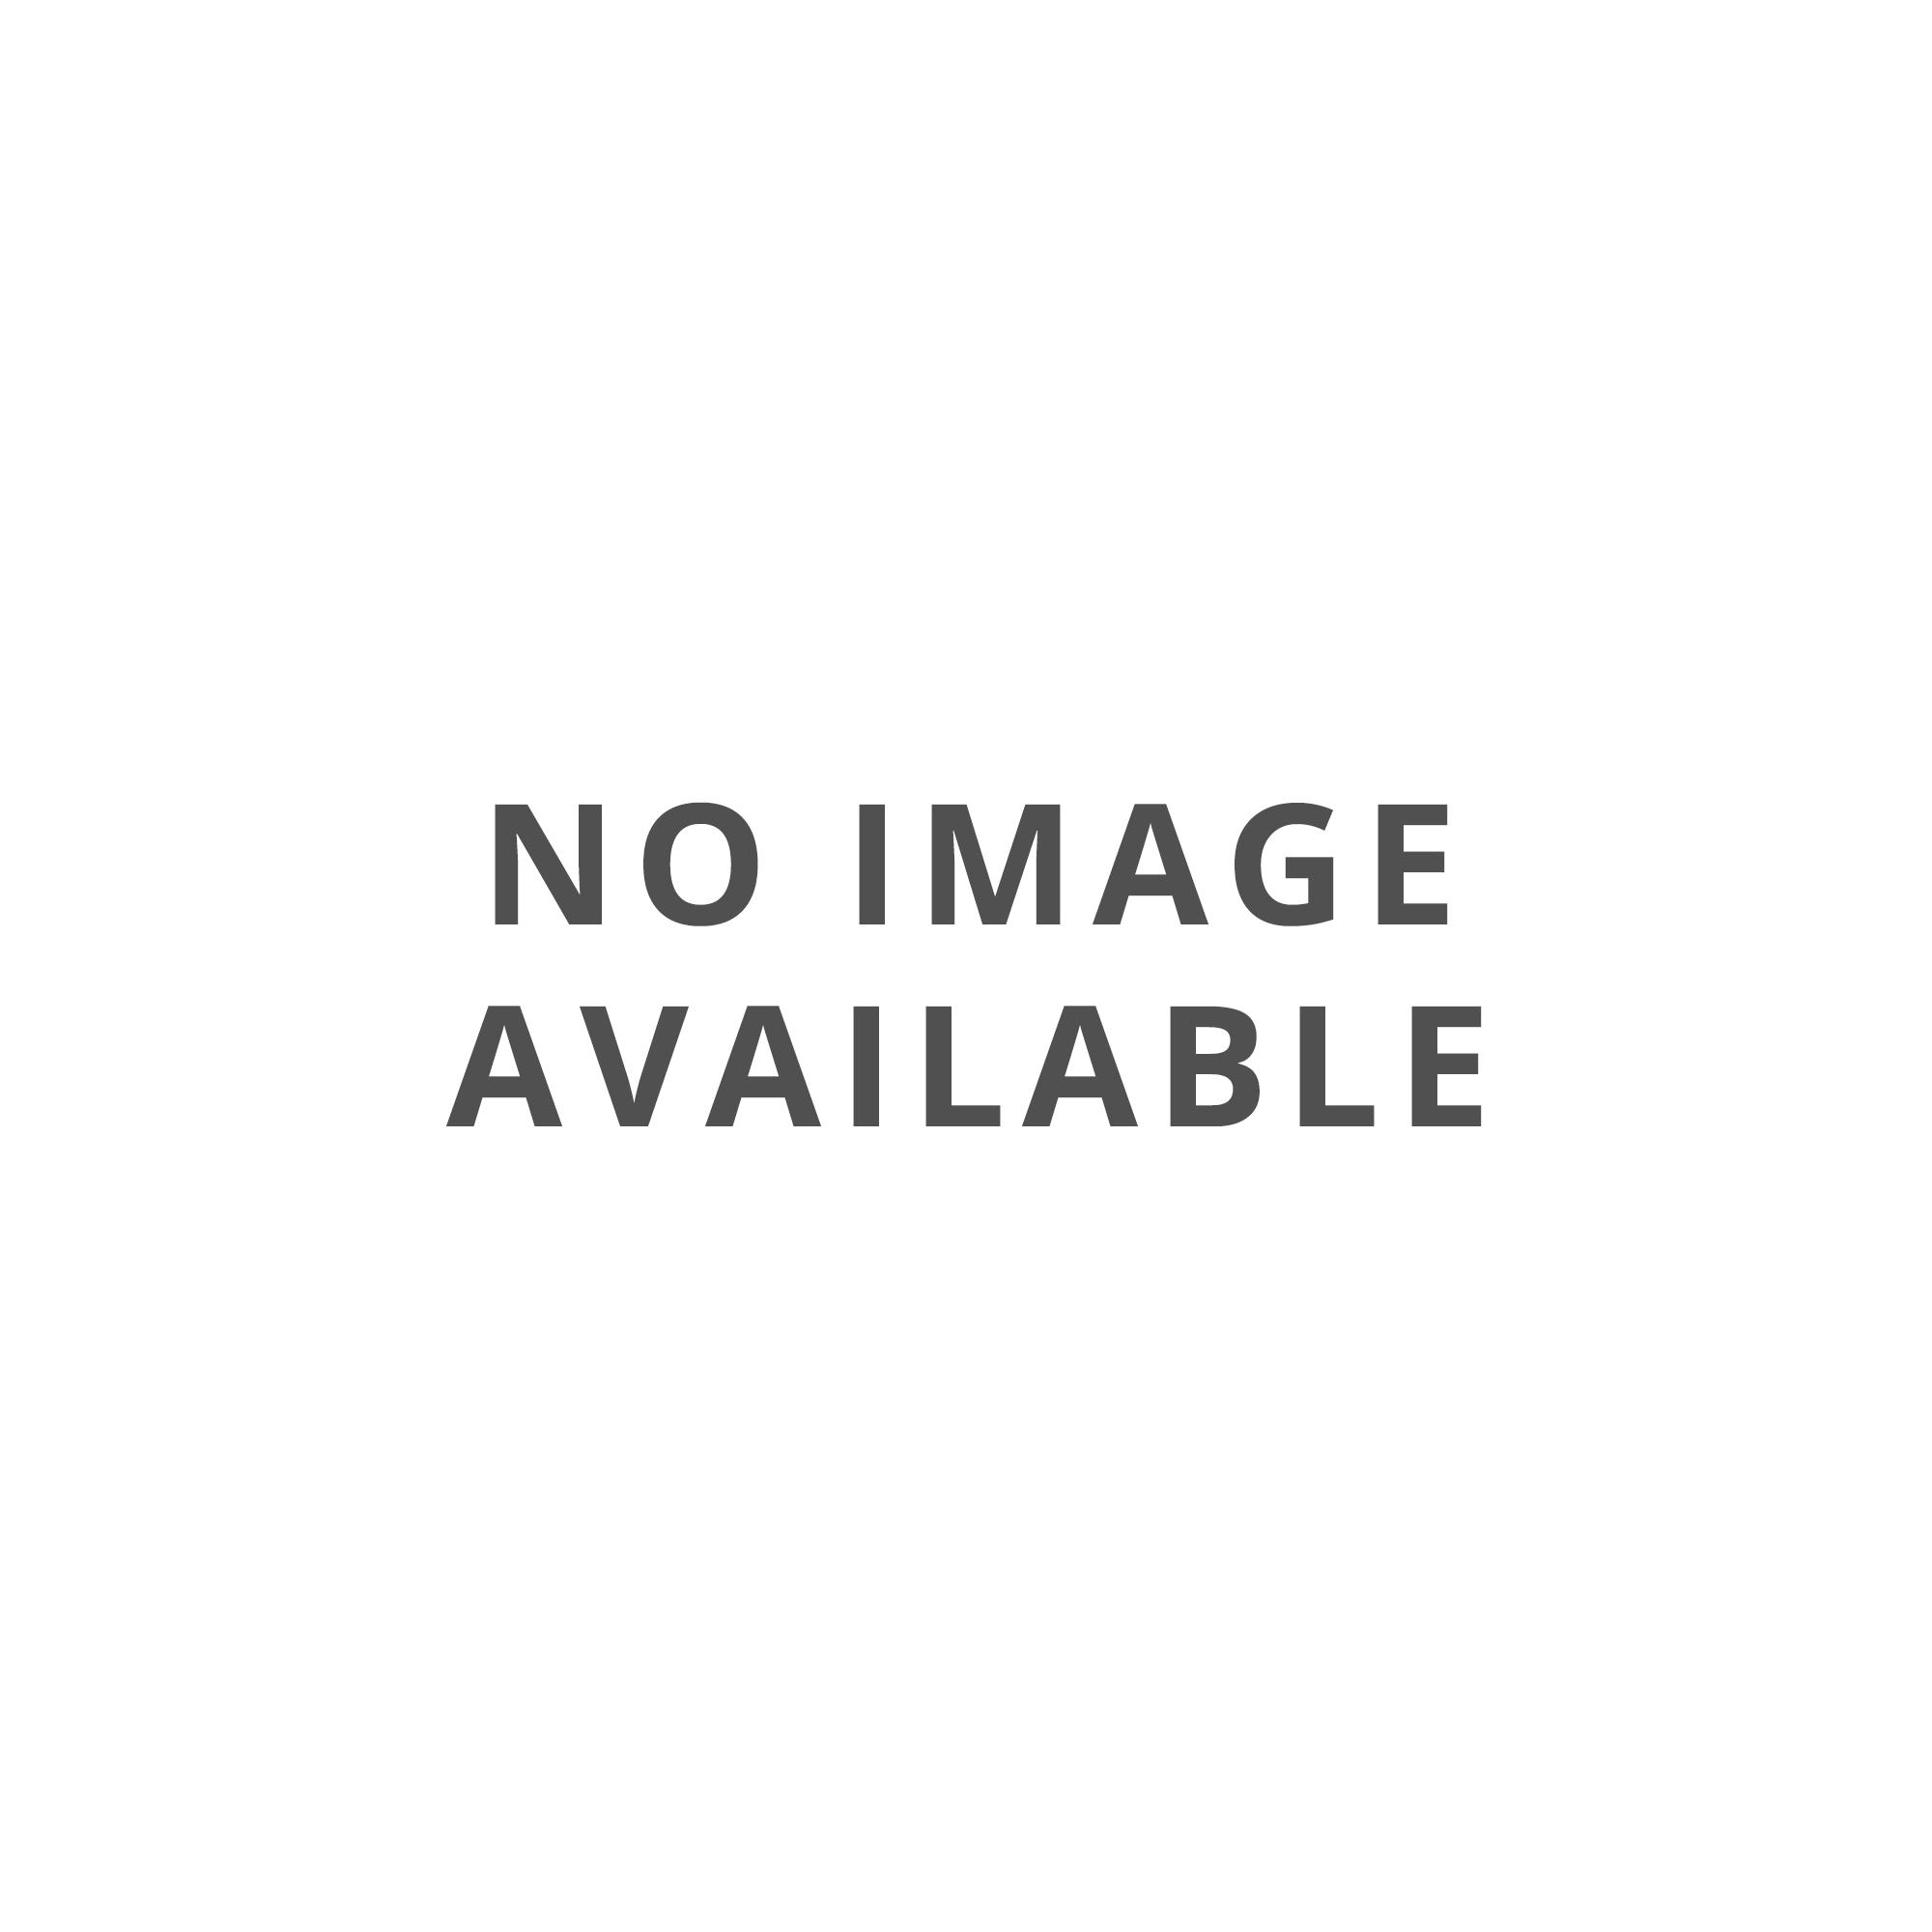 Rak Shine Stone Dark Beige 600x600 Natural Porcelain Tiles 4 Tiles